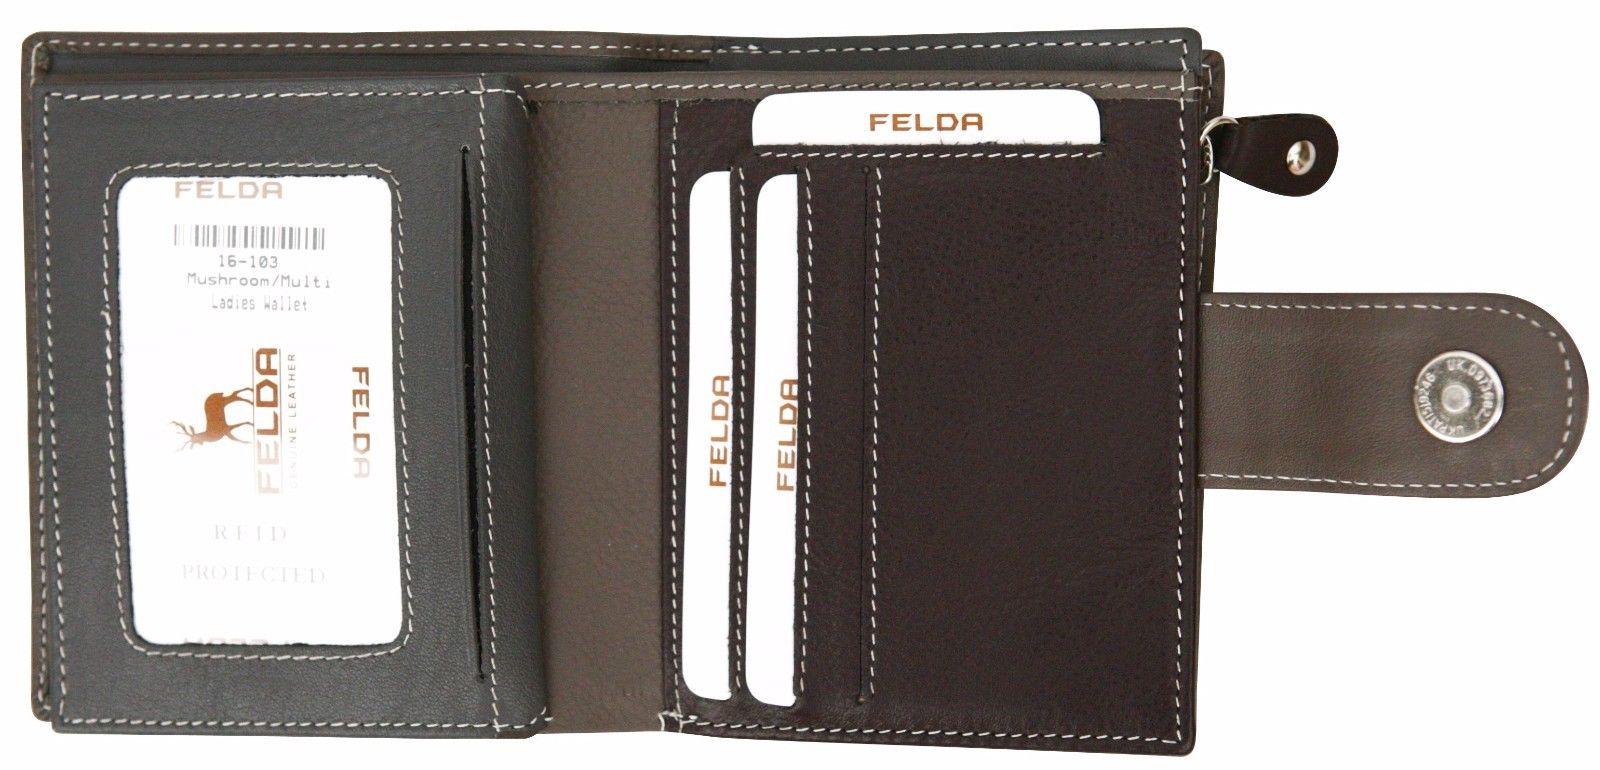 Felda-RFID-onorevoli-MEDAGLIA-amp-Card-Purse-Wallet-Genuine-Leather-Multi-SOFT-BOX-REGALO miniatura 58